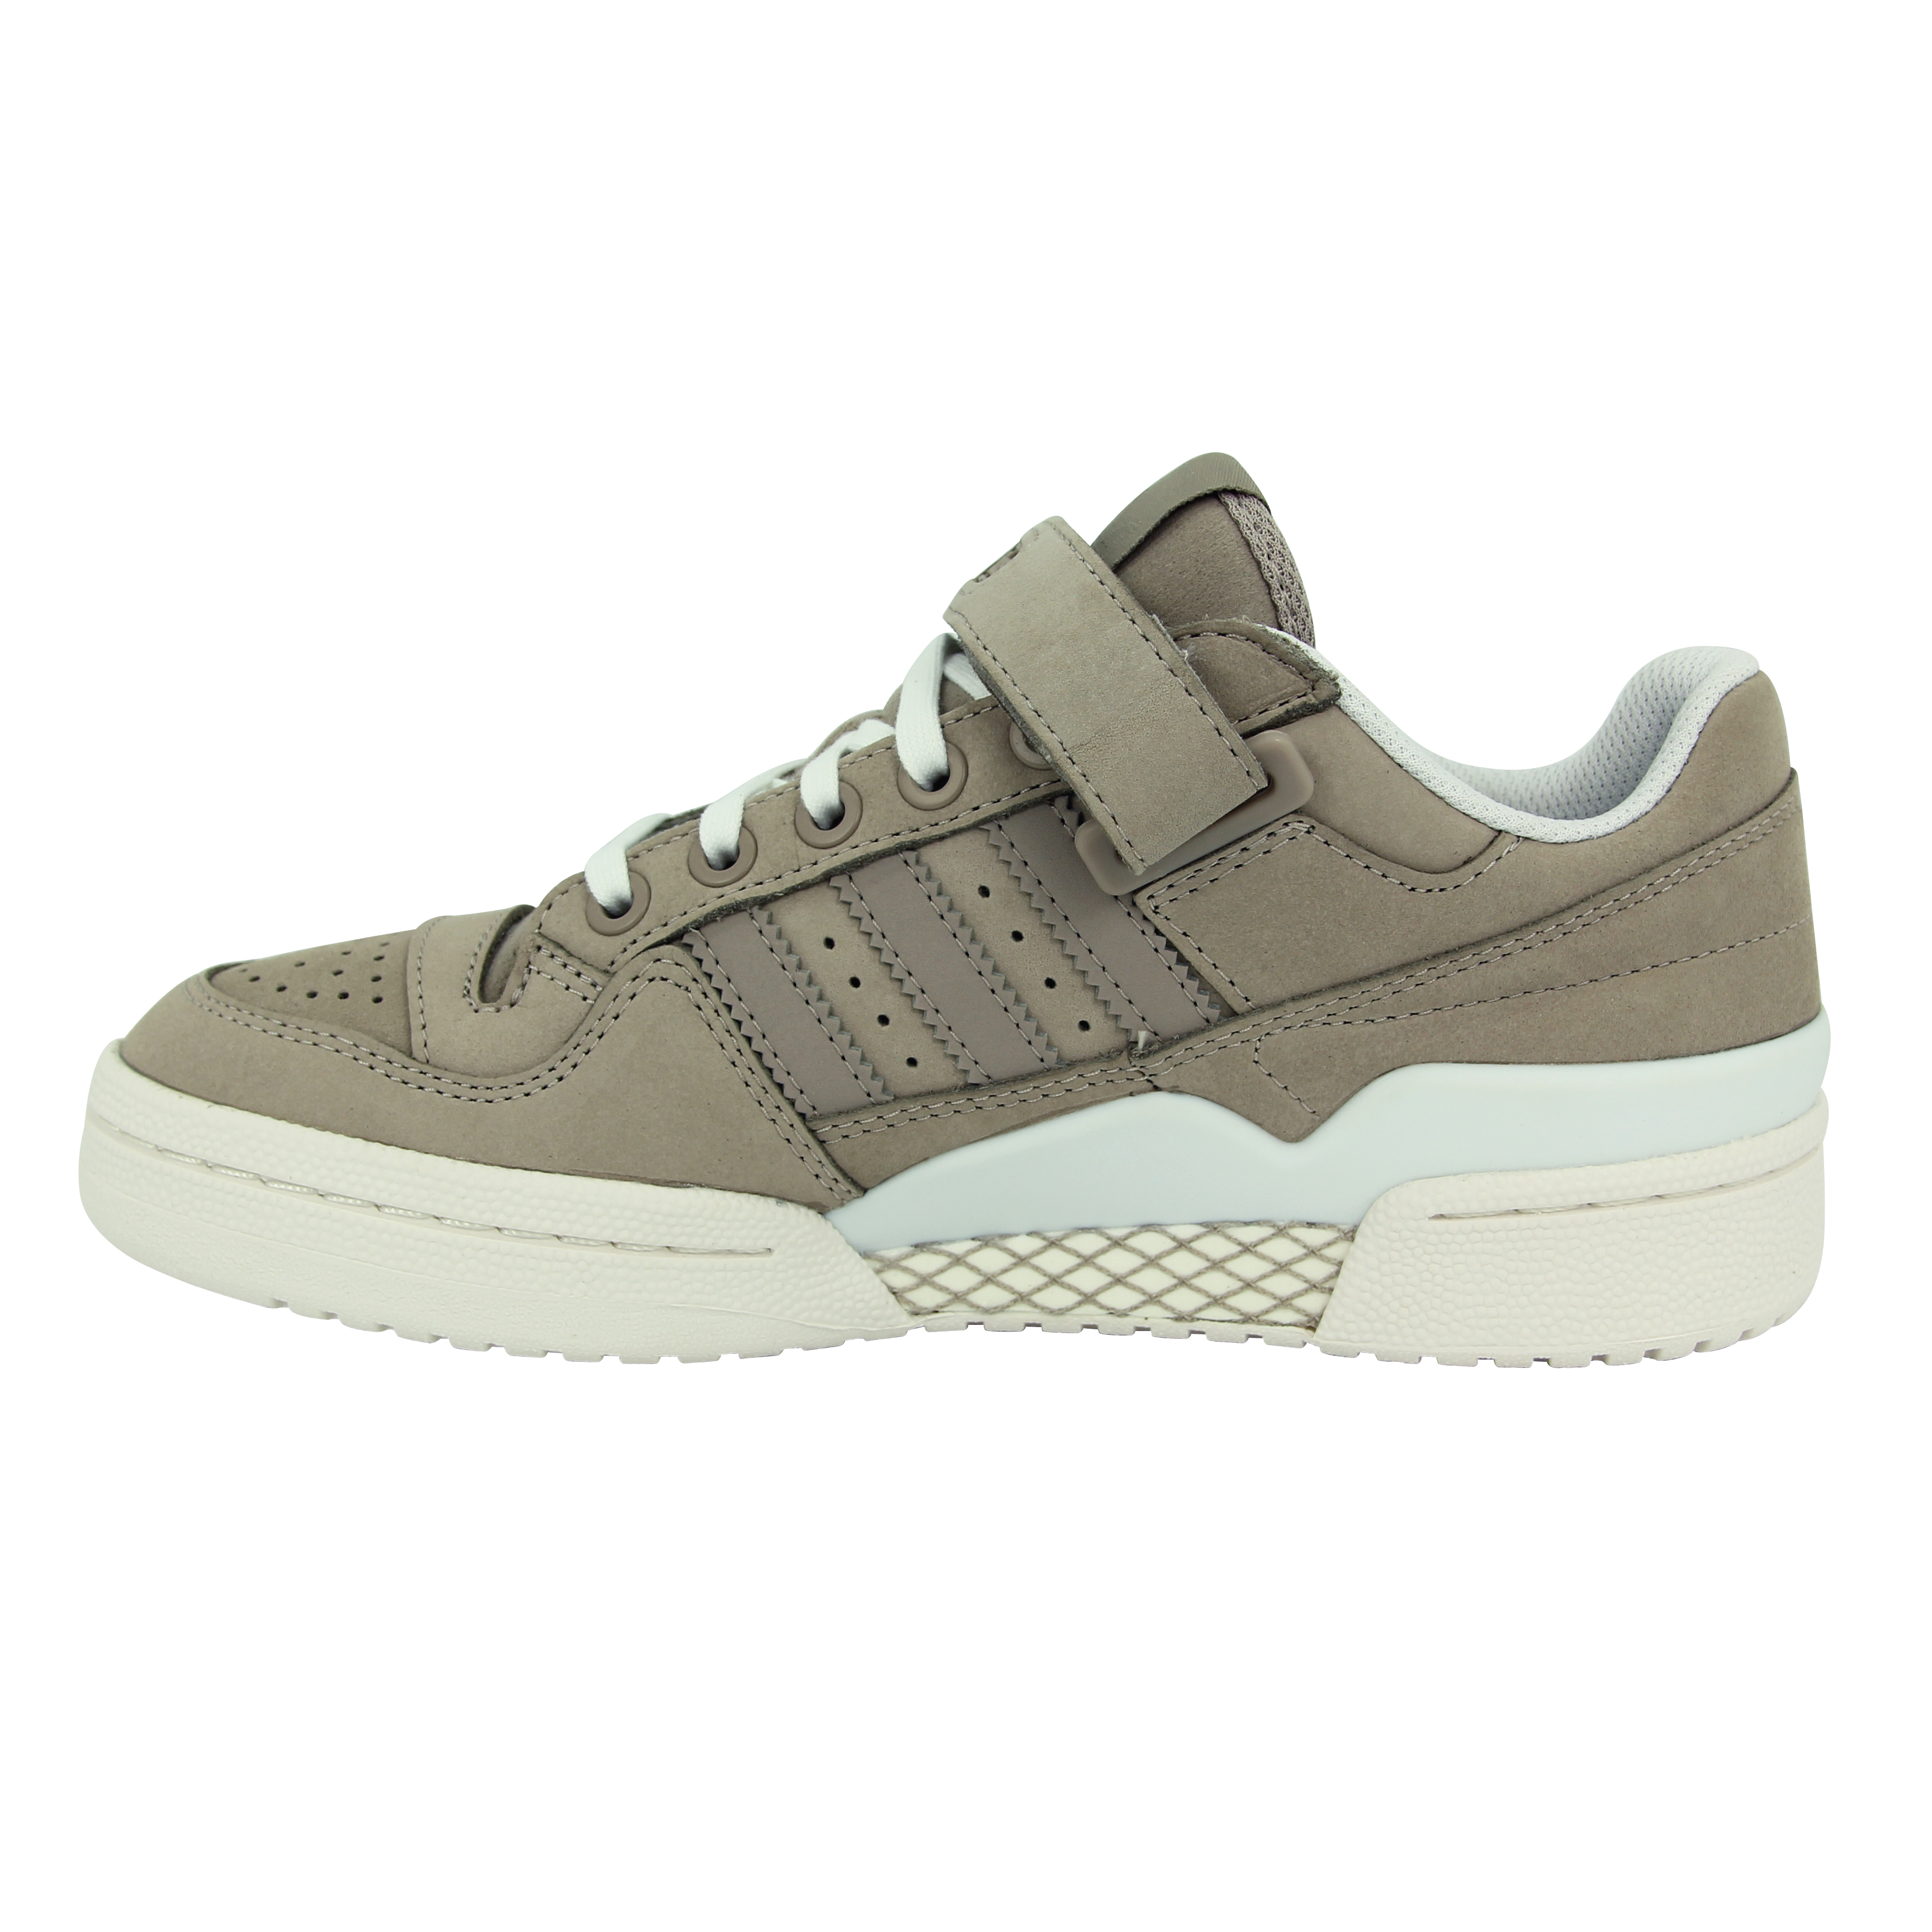 cheaper b0e97 849dc adidas Originals FORUM LOW Cuir Chaussures Mode Sneakers Unisex 3 3 sur 6  ...